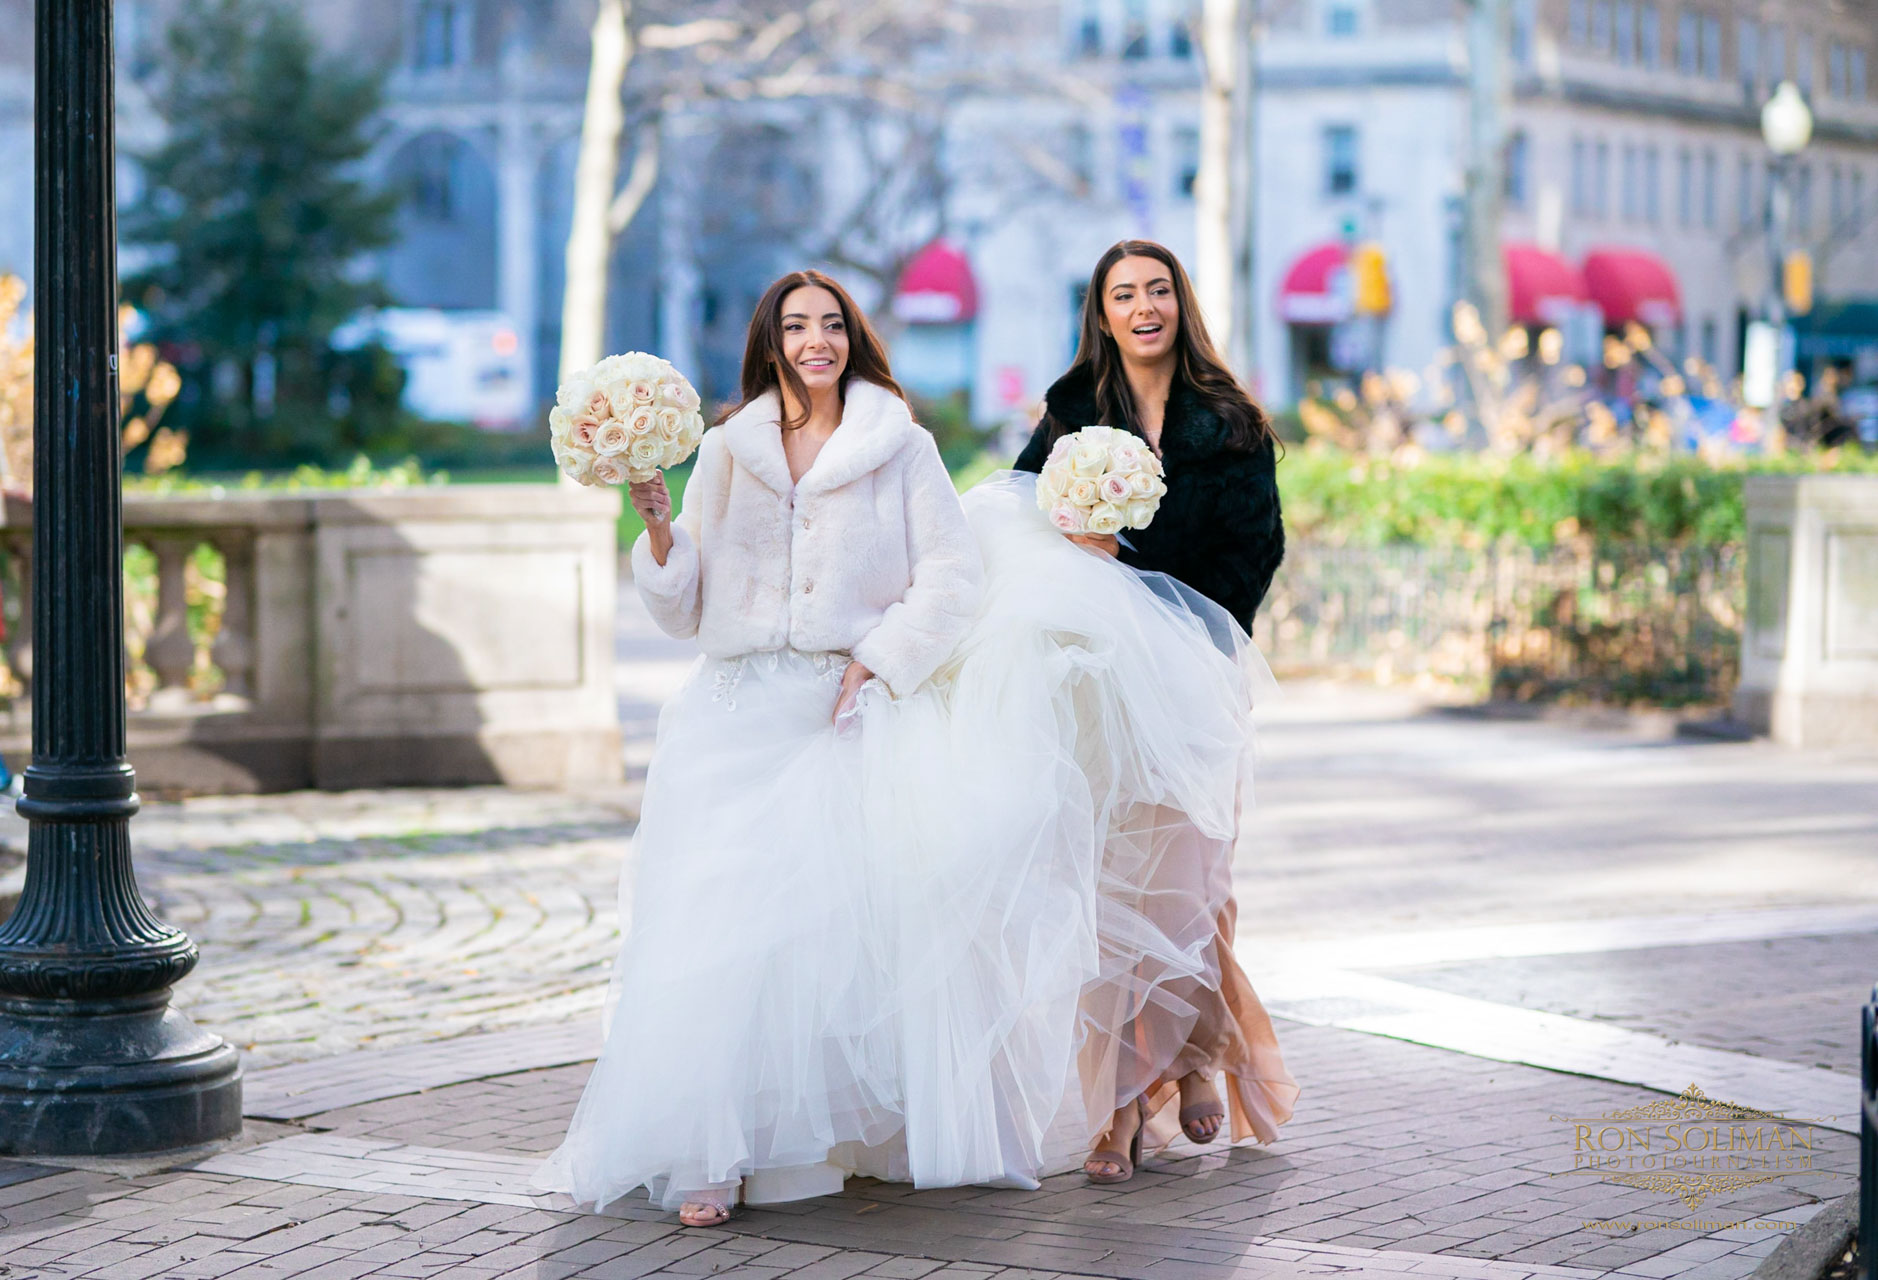 TENDENZA WEDDING 312